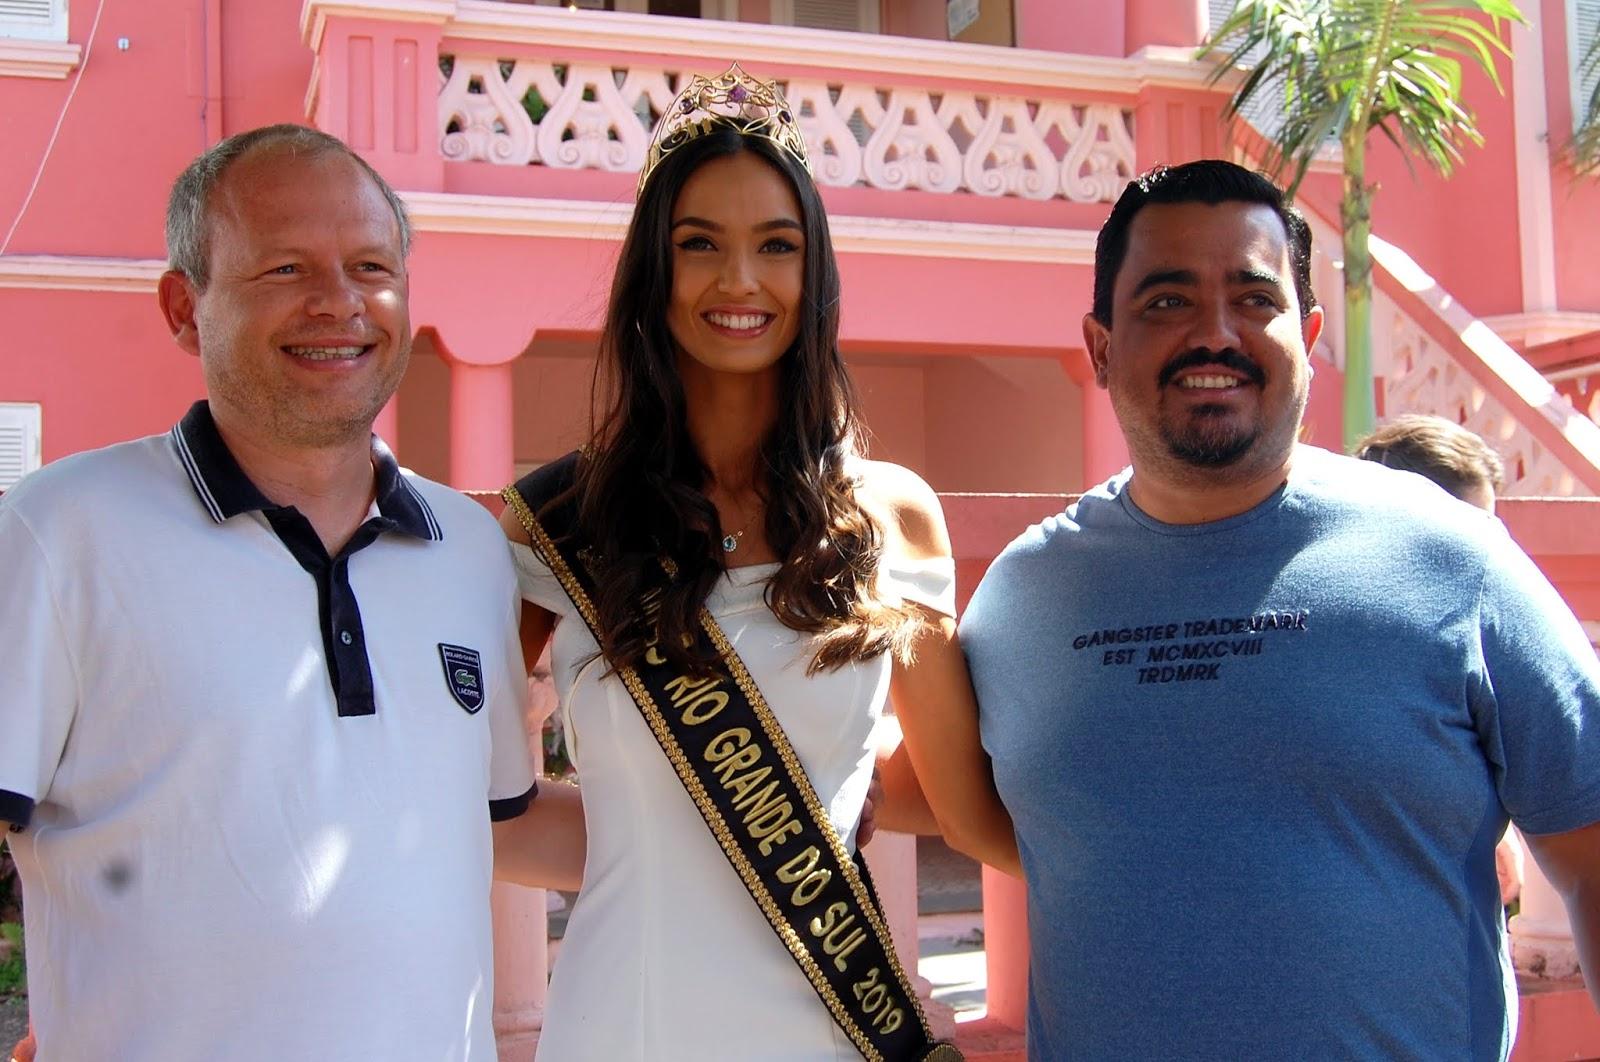 bianca scheren, top 5 de miss brasil universo 2019. - Página 5 Dsc_0025